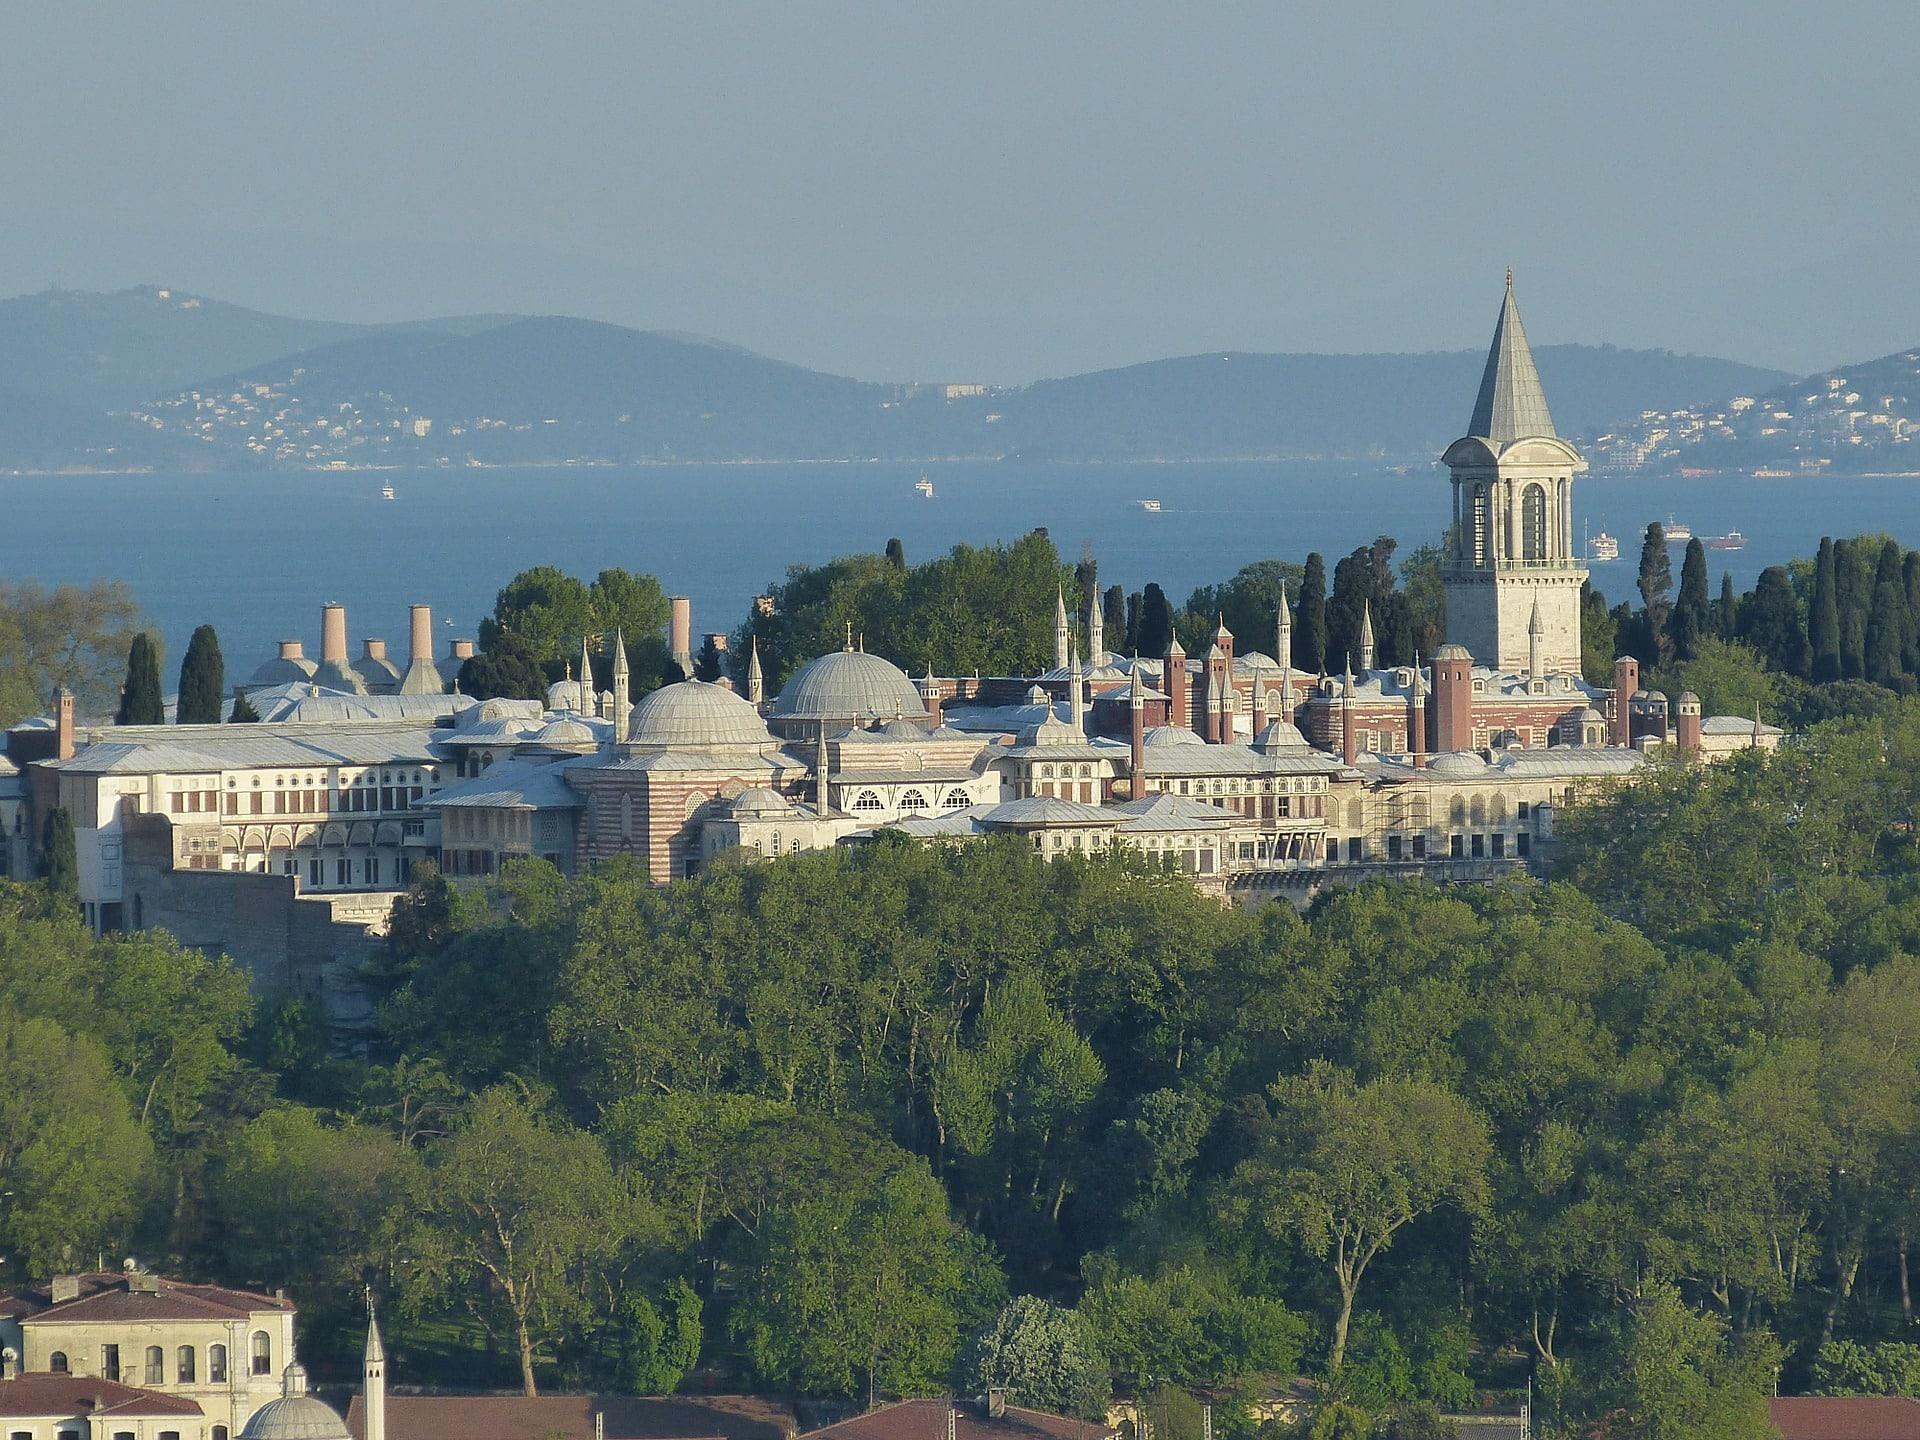 Istanbul Sehenswürdigkeiten: Topkapi Palast